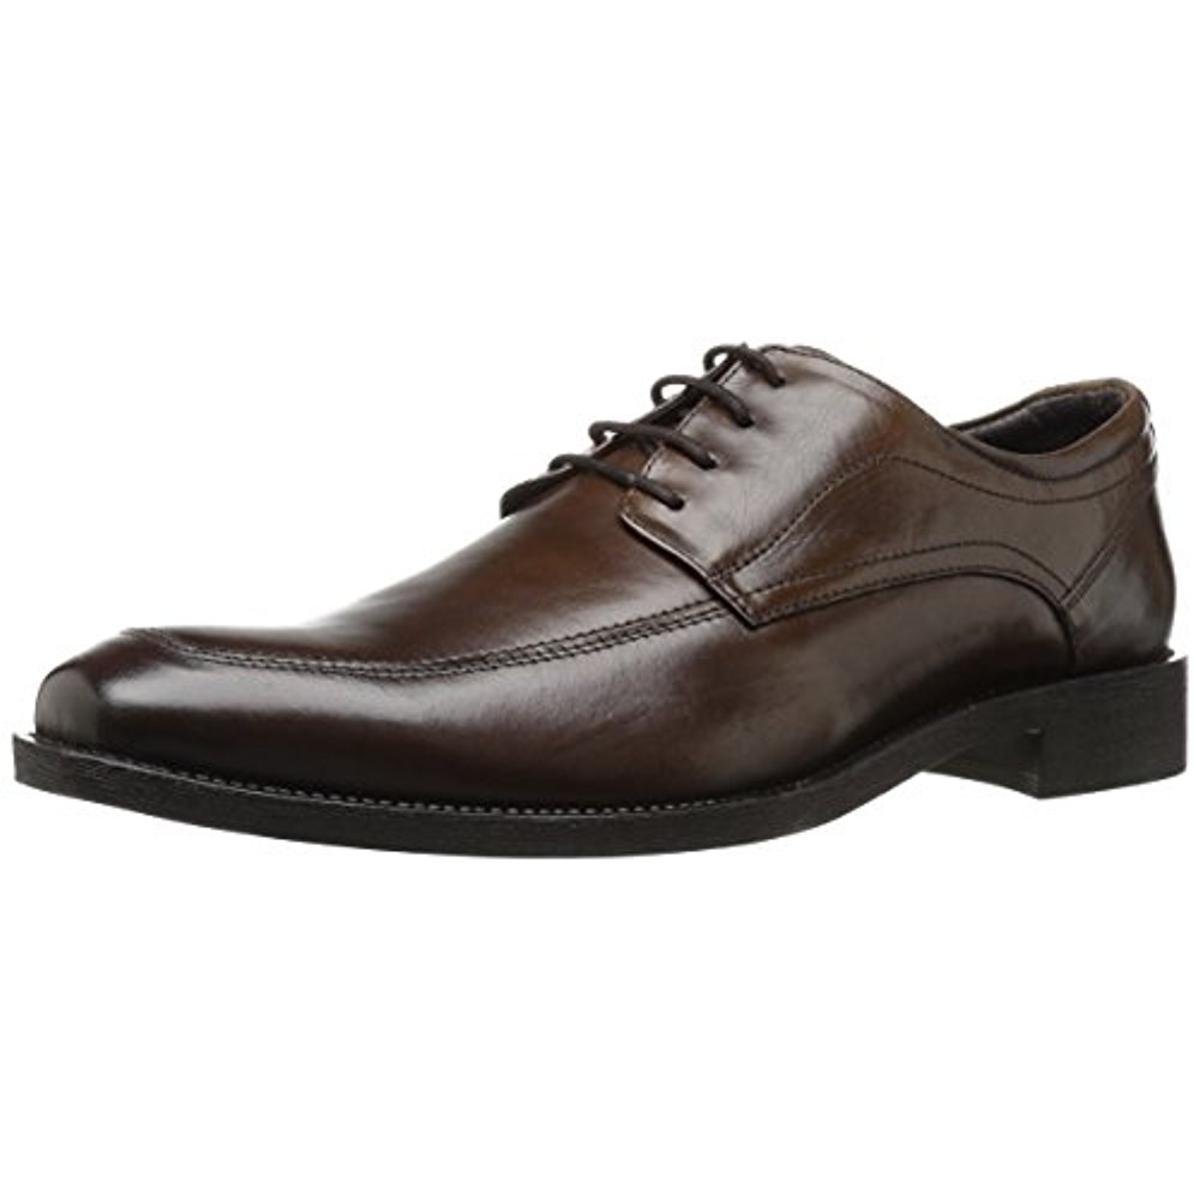 Giorgio Brutini Mens Cleveland Leather Square Toe Loafers by Giorgio Brutini